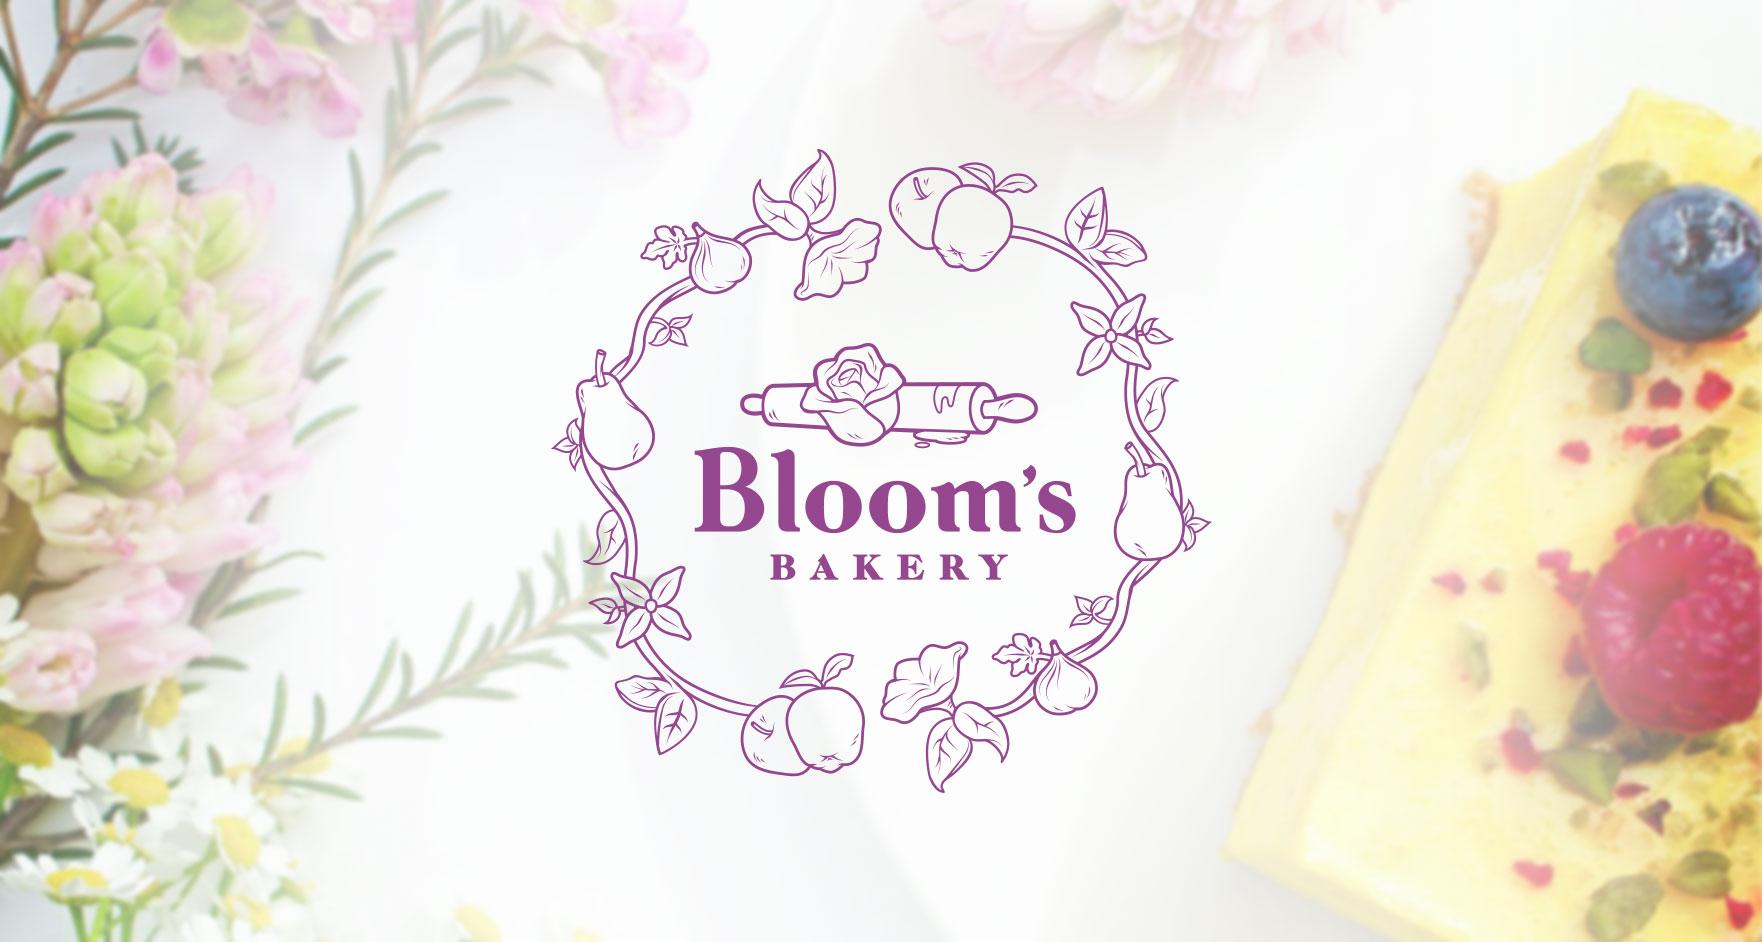 Blooms-banner.jpg